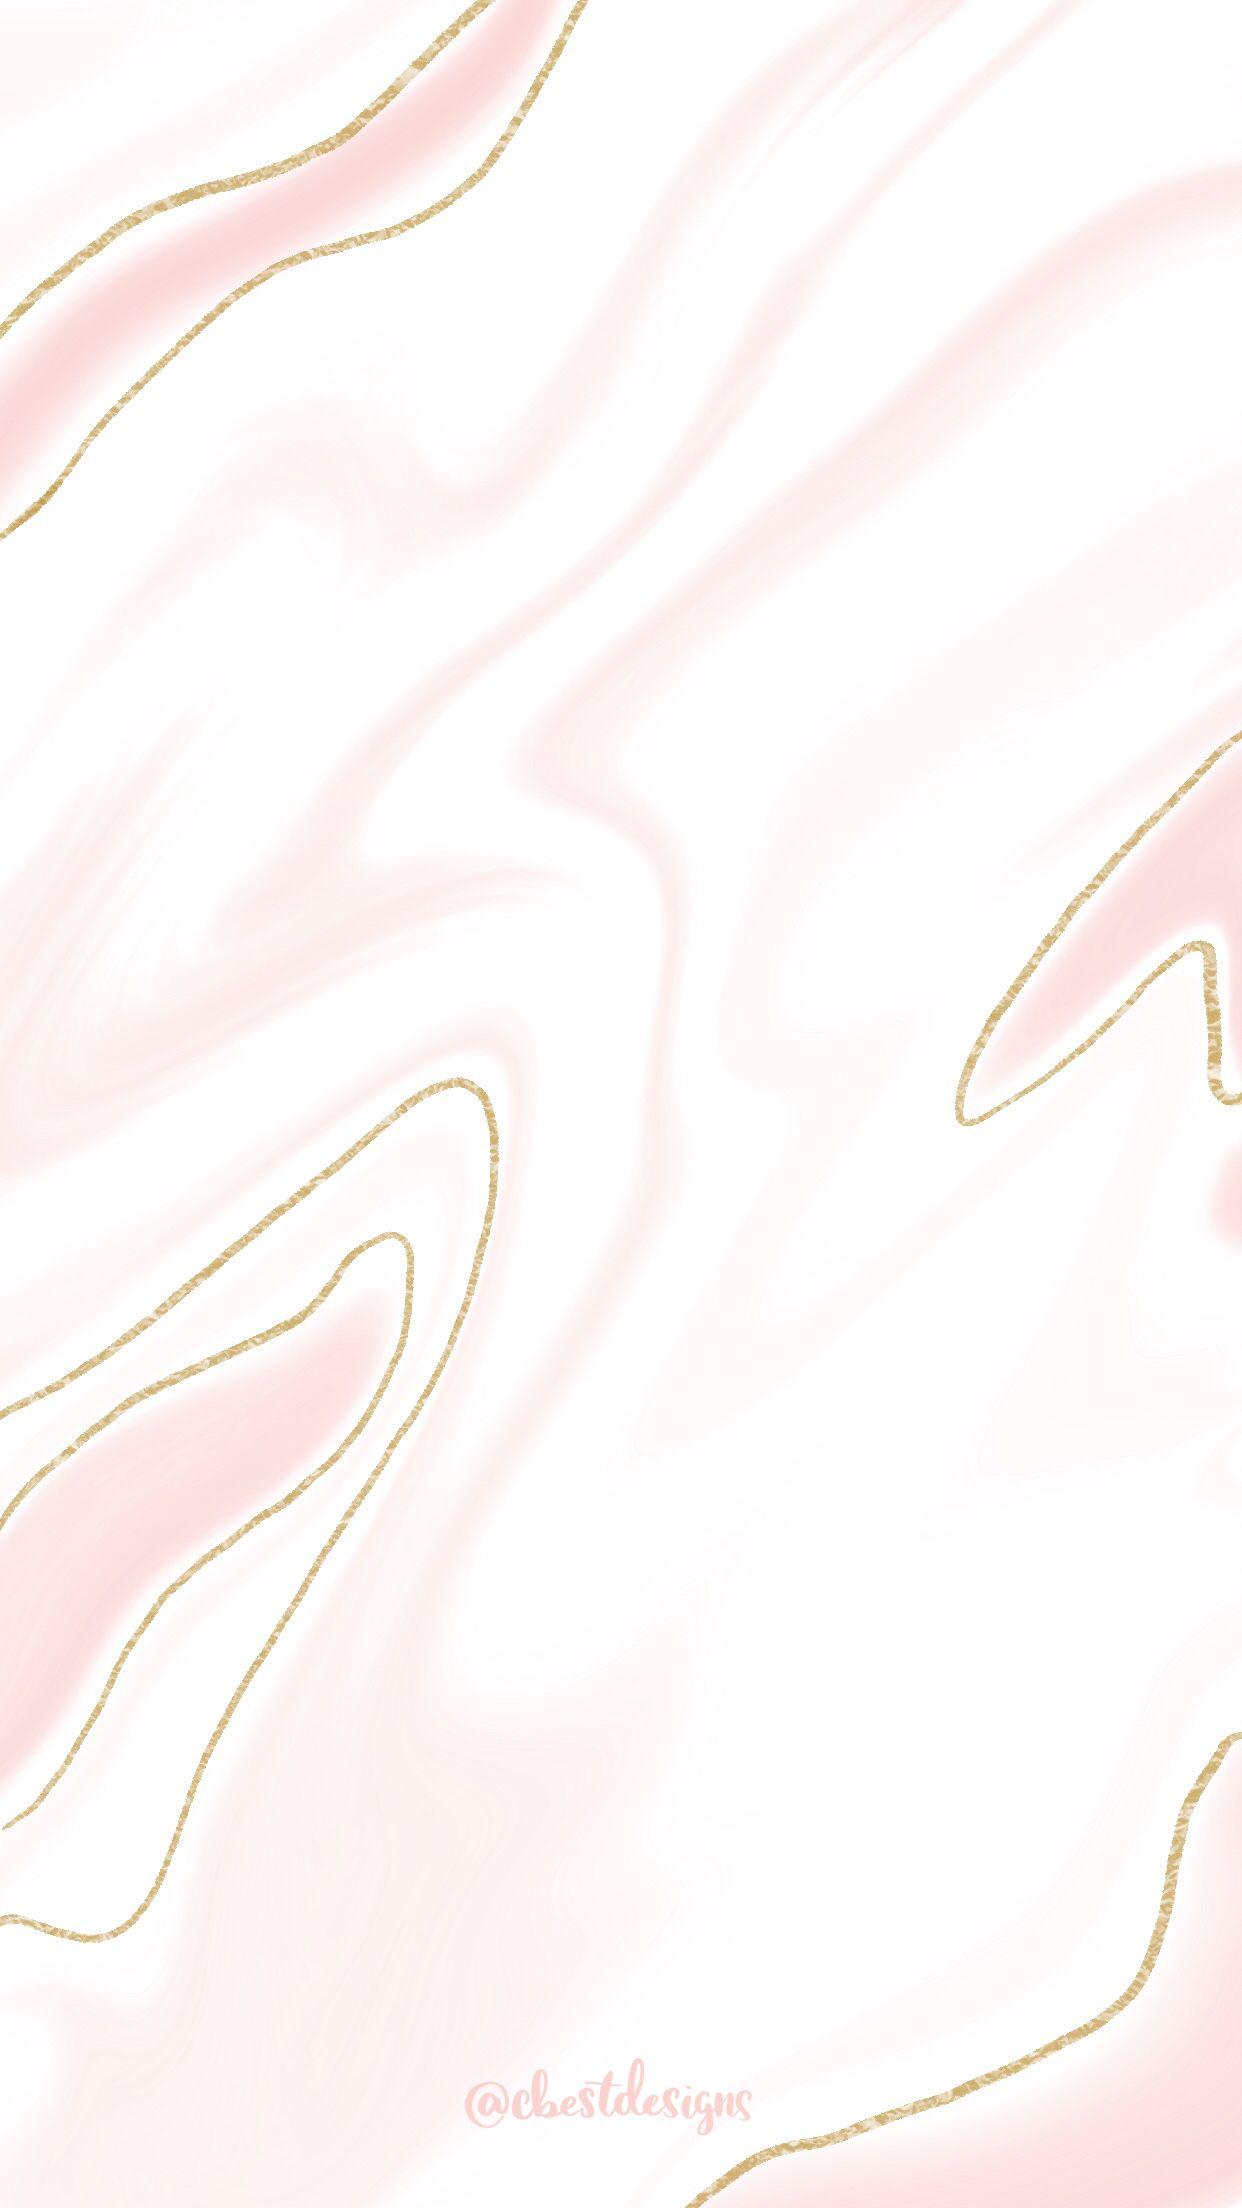 Rose Gold Free Ipad Wallpaper